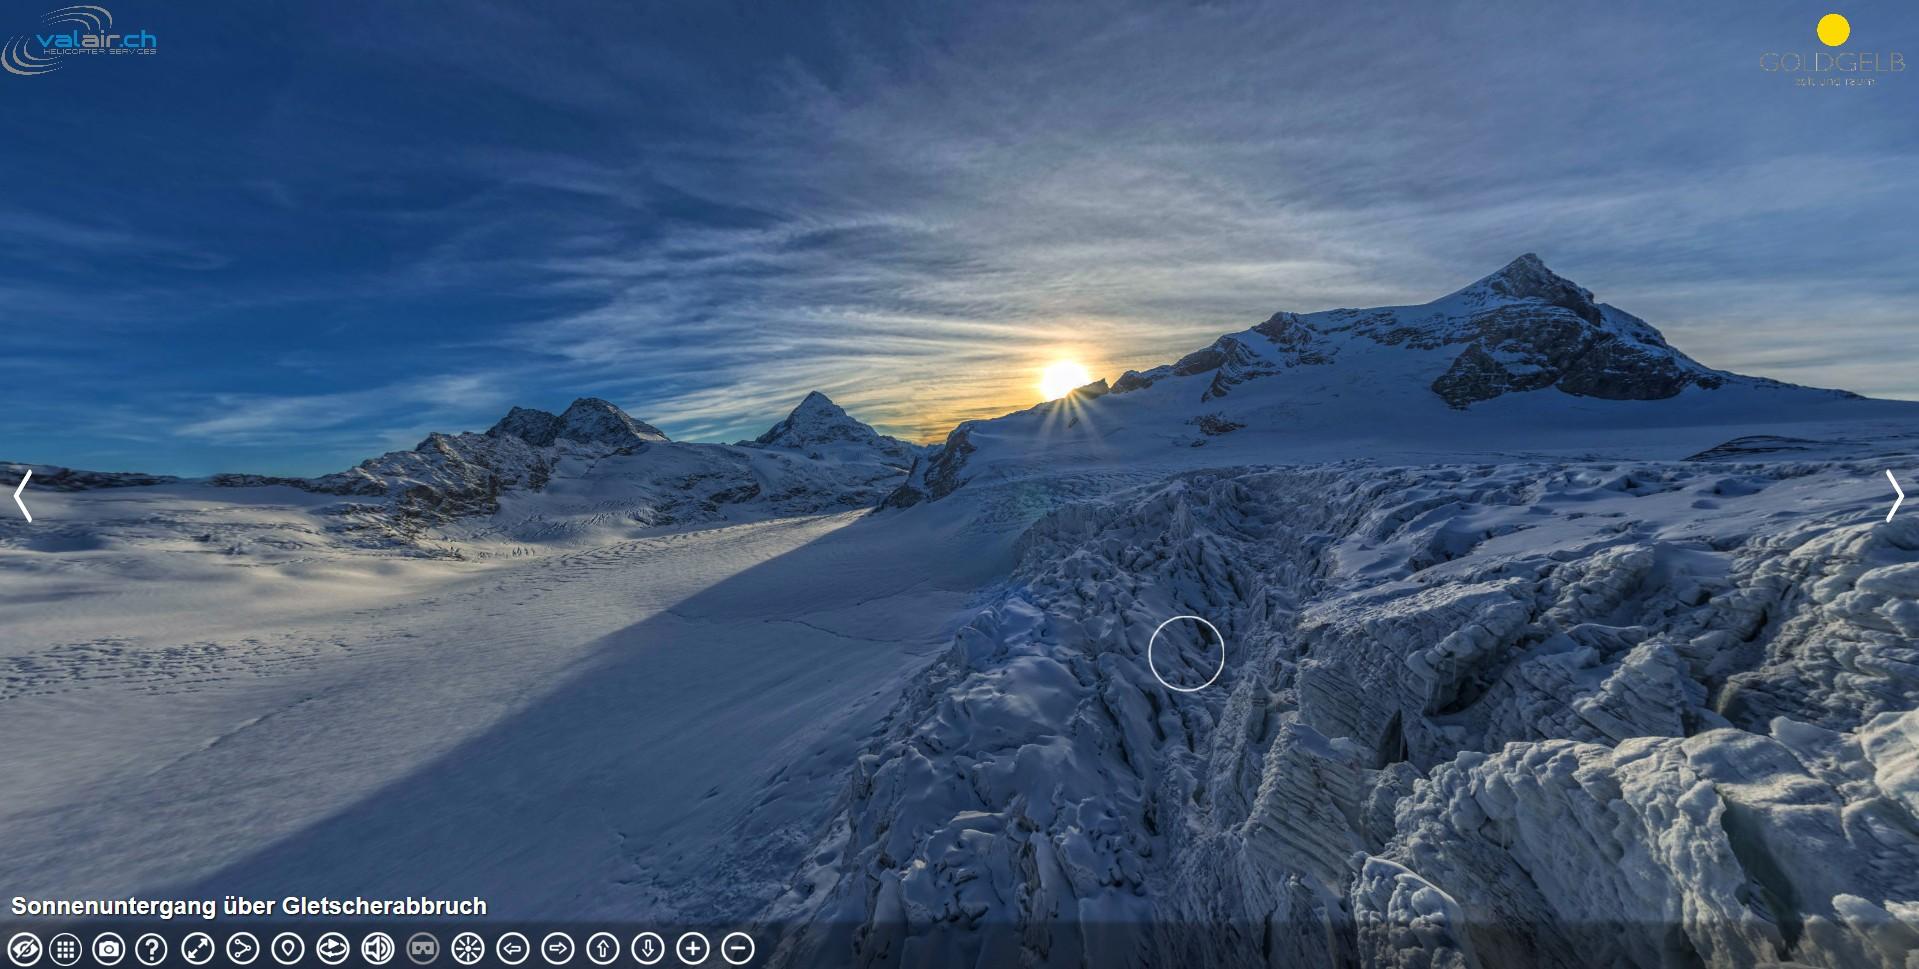 360 Grad Fotografie / Virtual Reality: Gewerbe Fotografie: Valair